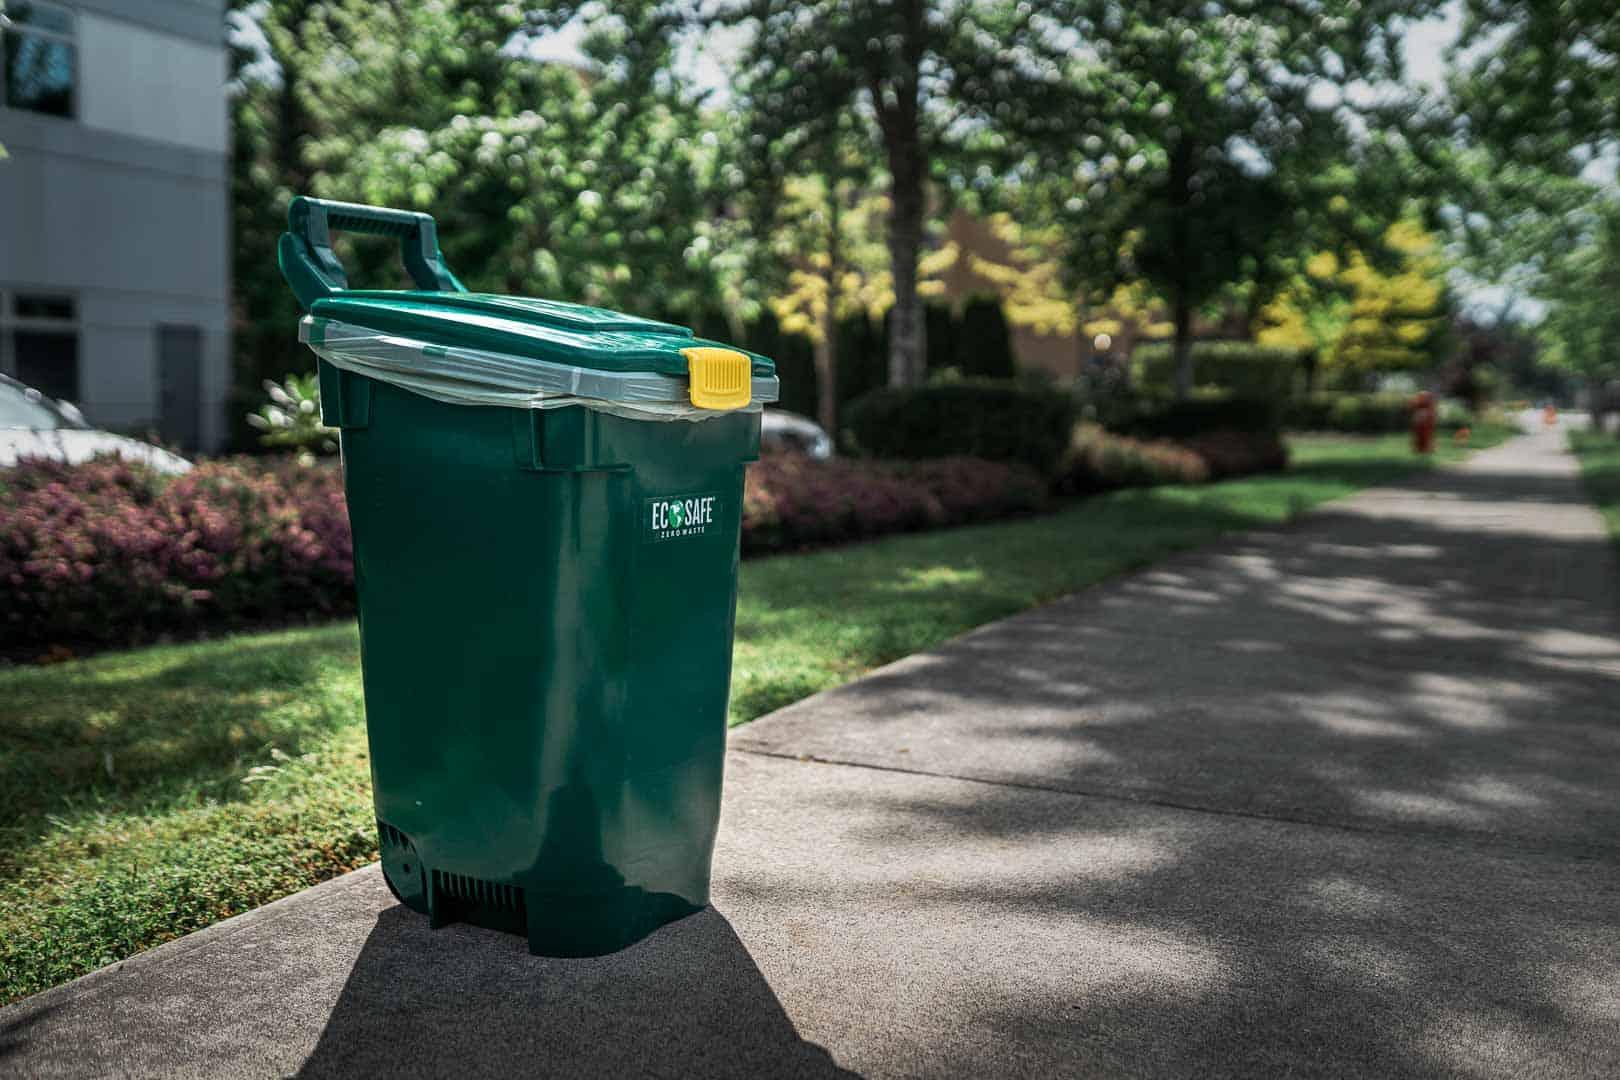 Ecosafe Green | Zero waste - green compost bin